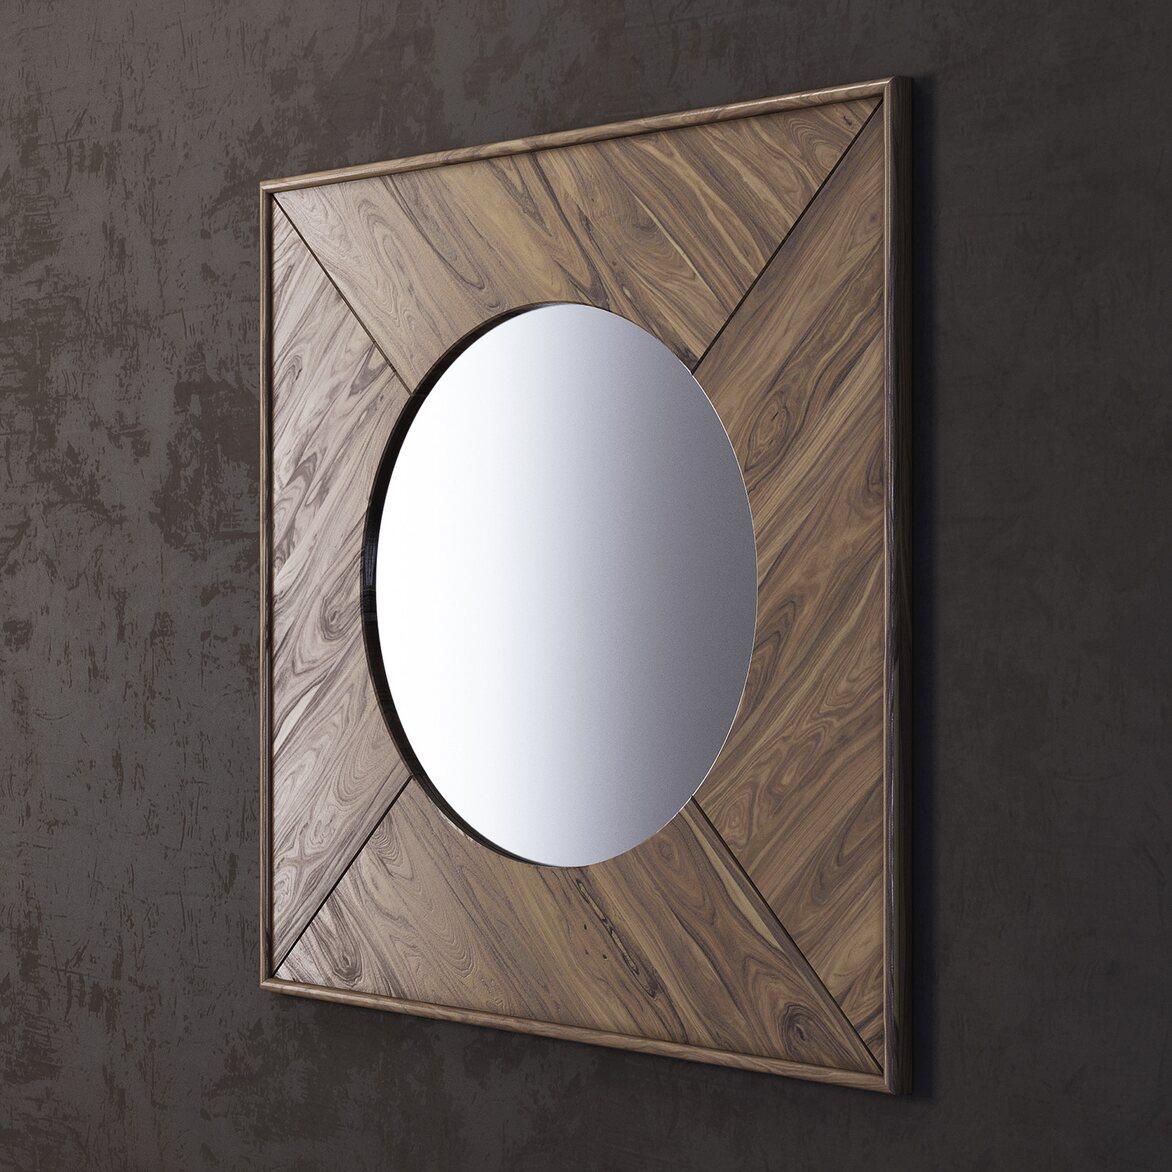 Зеркало Forms 2 | Настенные зеркала Kingsby